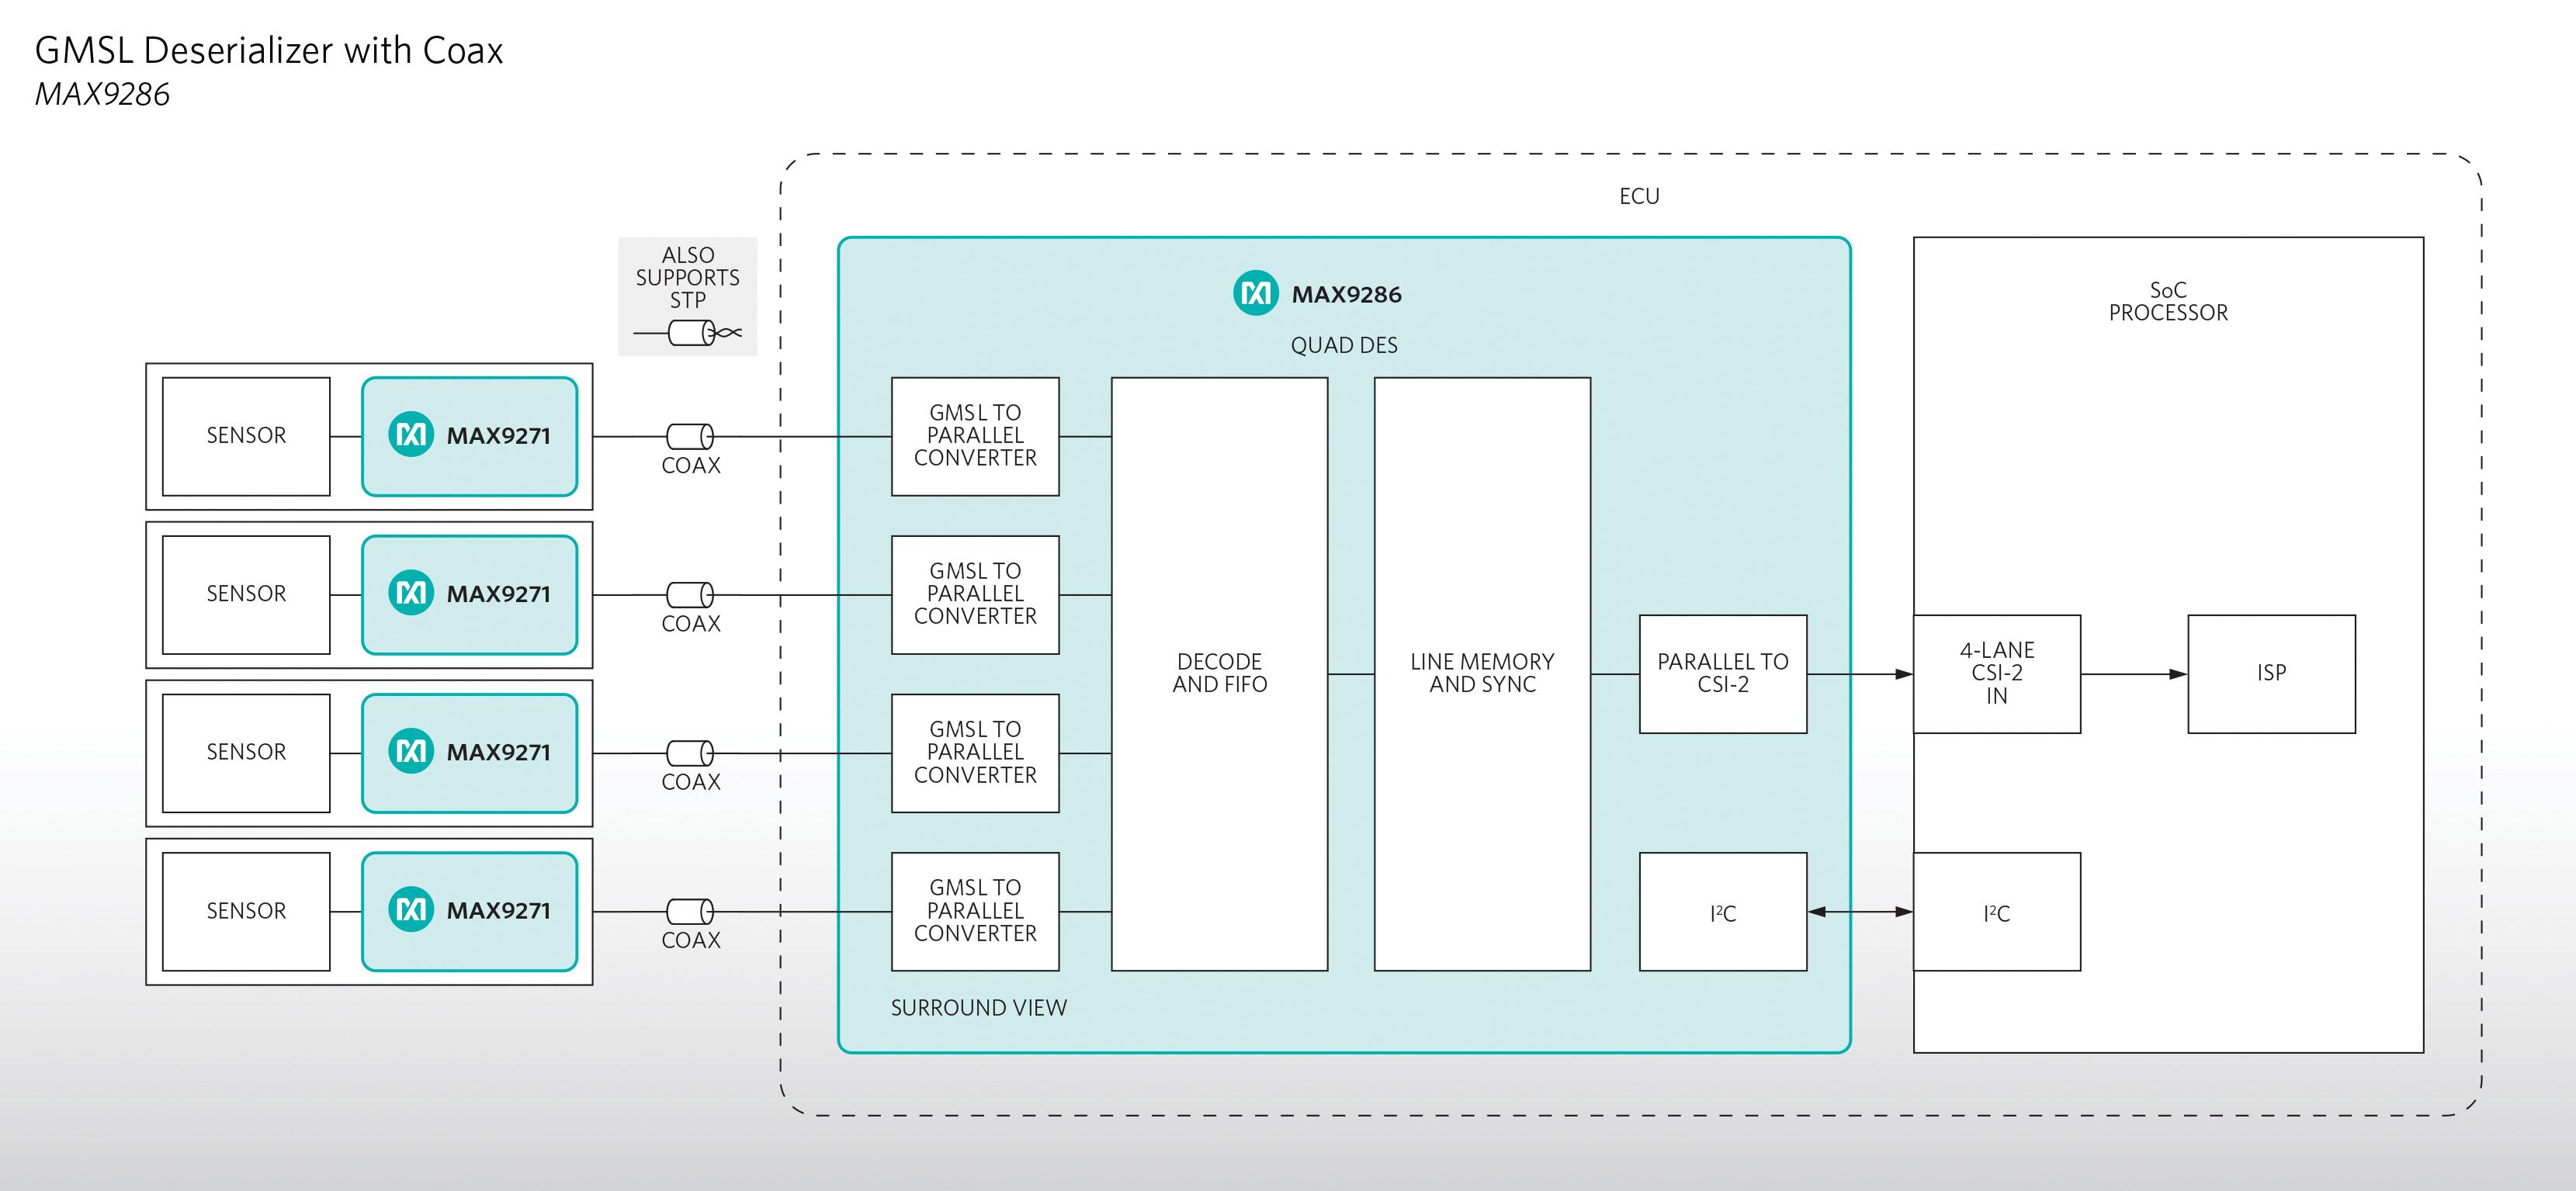 Deserializer Integrates Four Surround View Camera Streams in